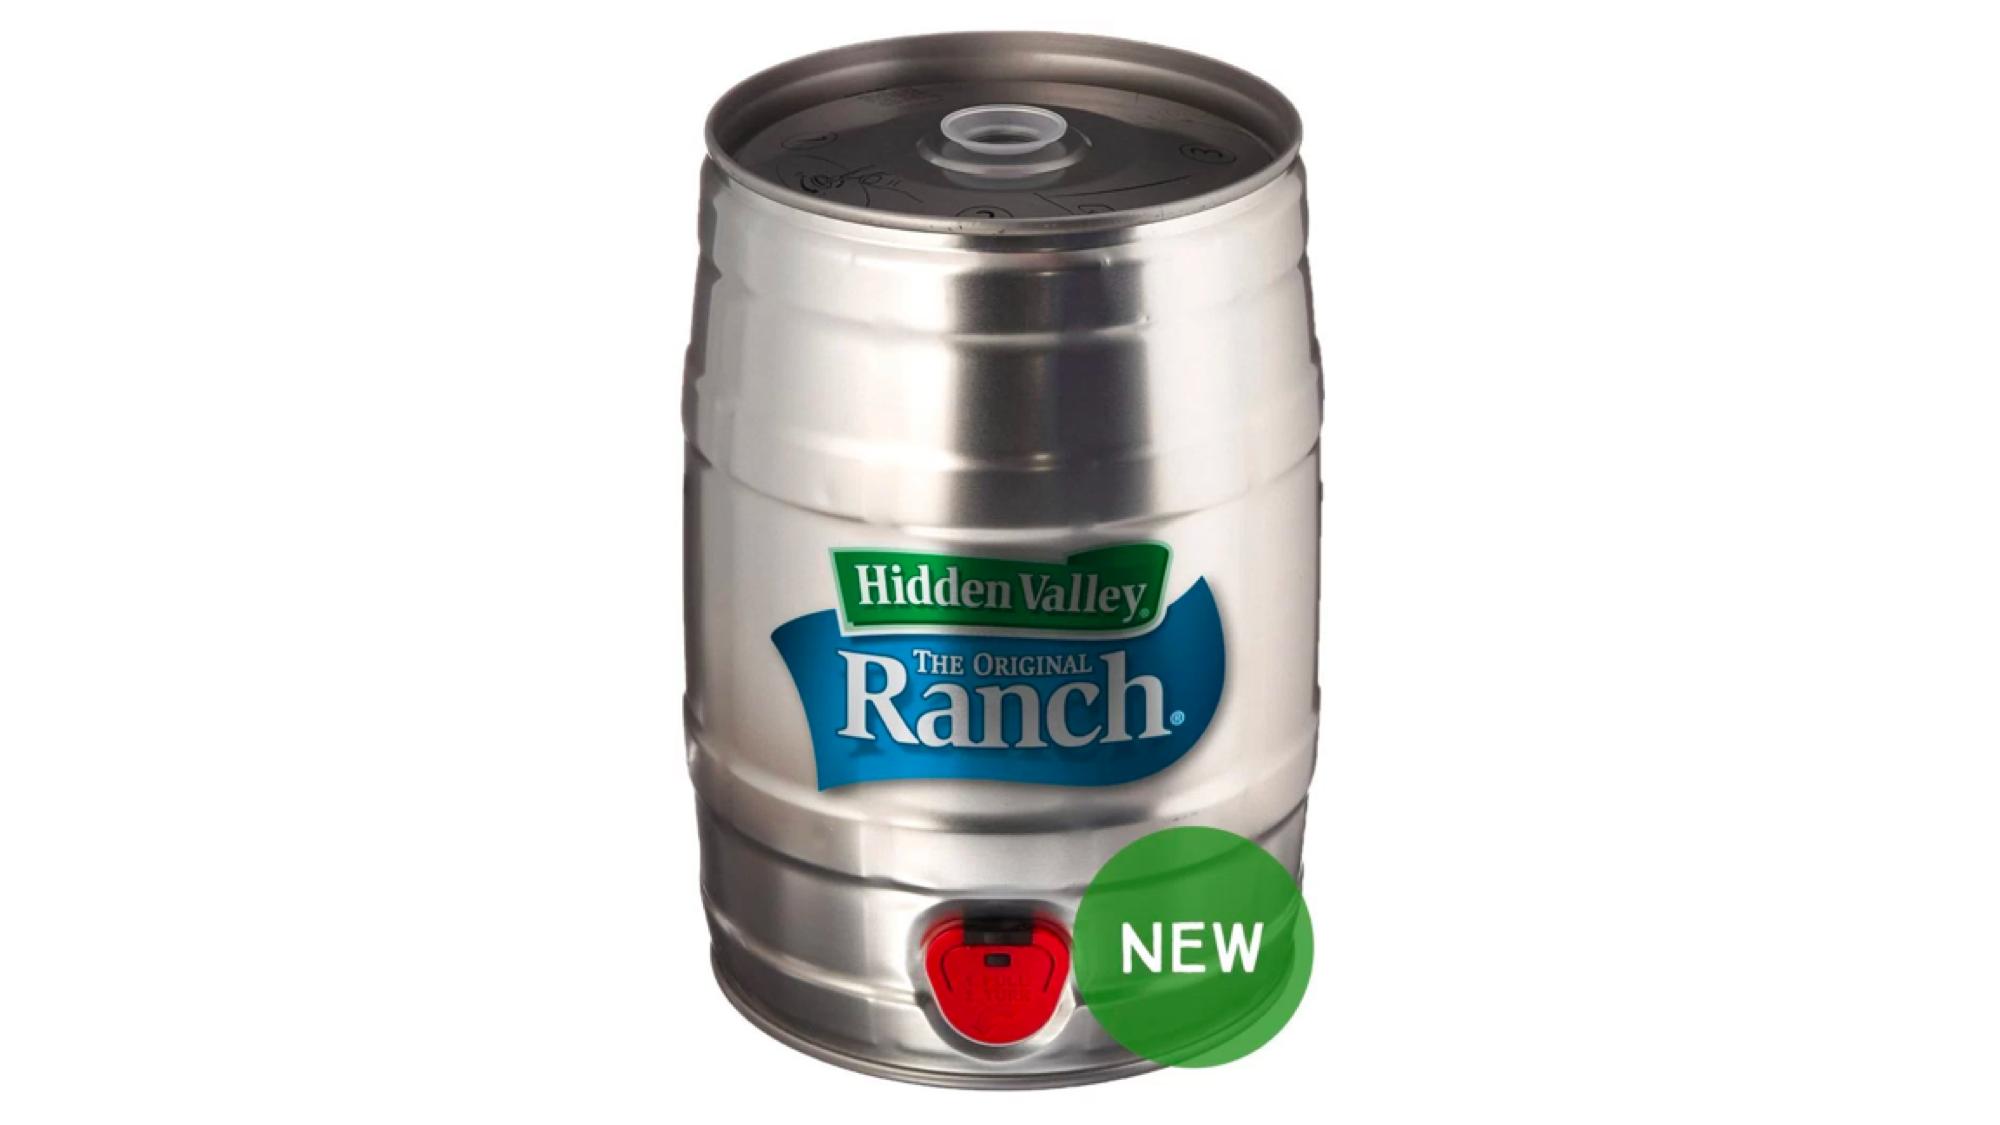 Keg of Ranch